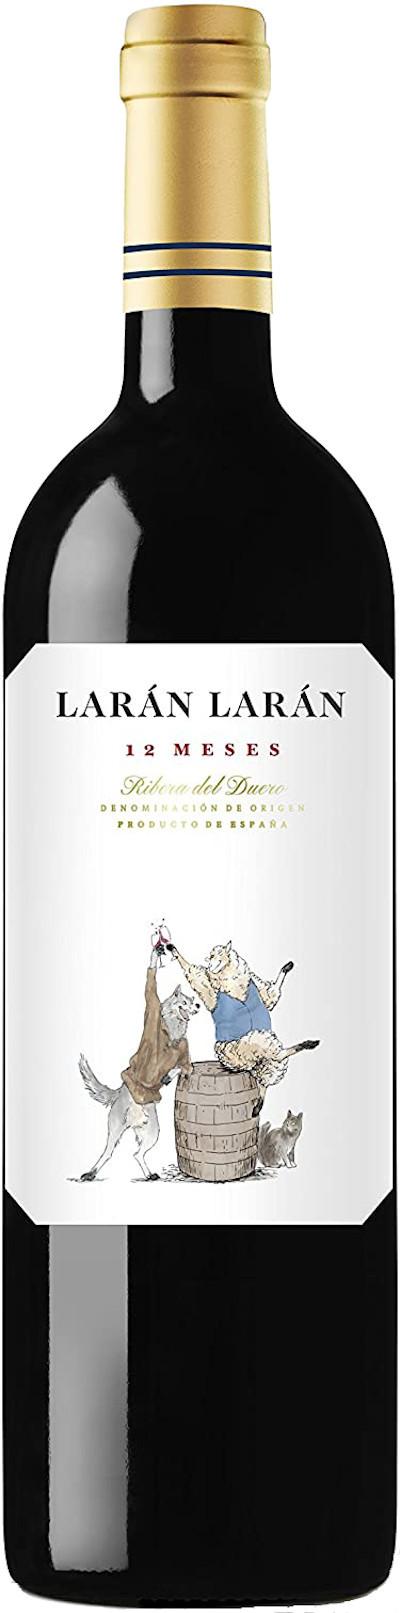 Vizcarra - Larán Larán 12 Meses Ribera del Duero DO Magnum